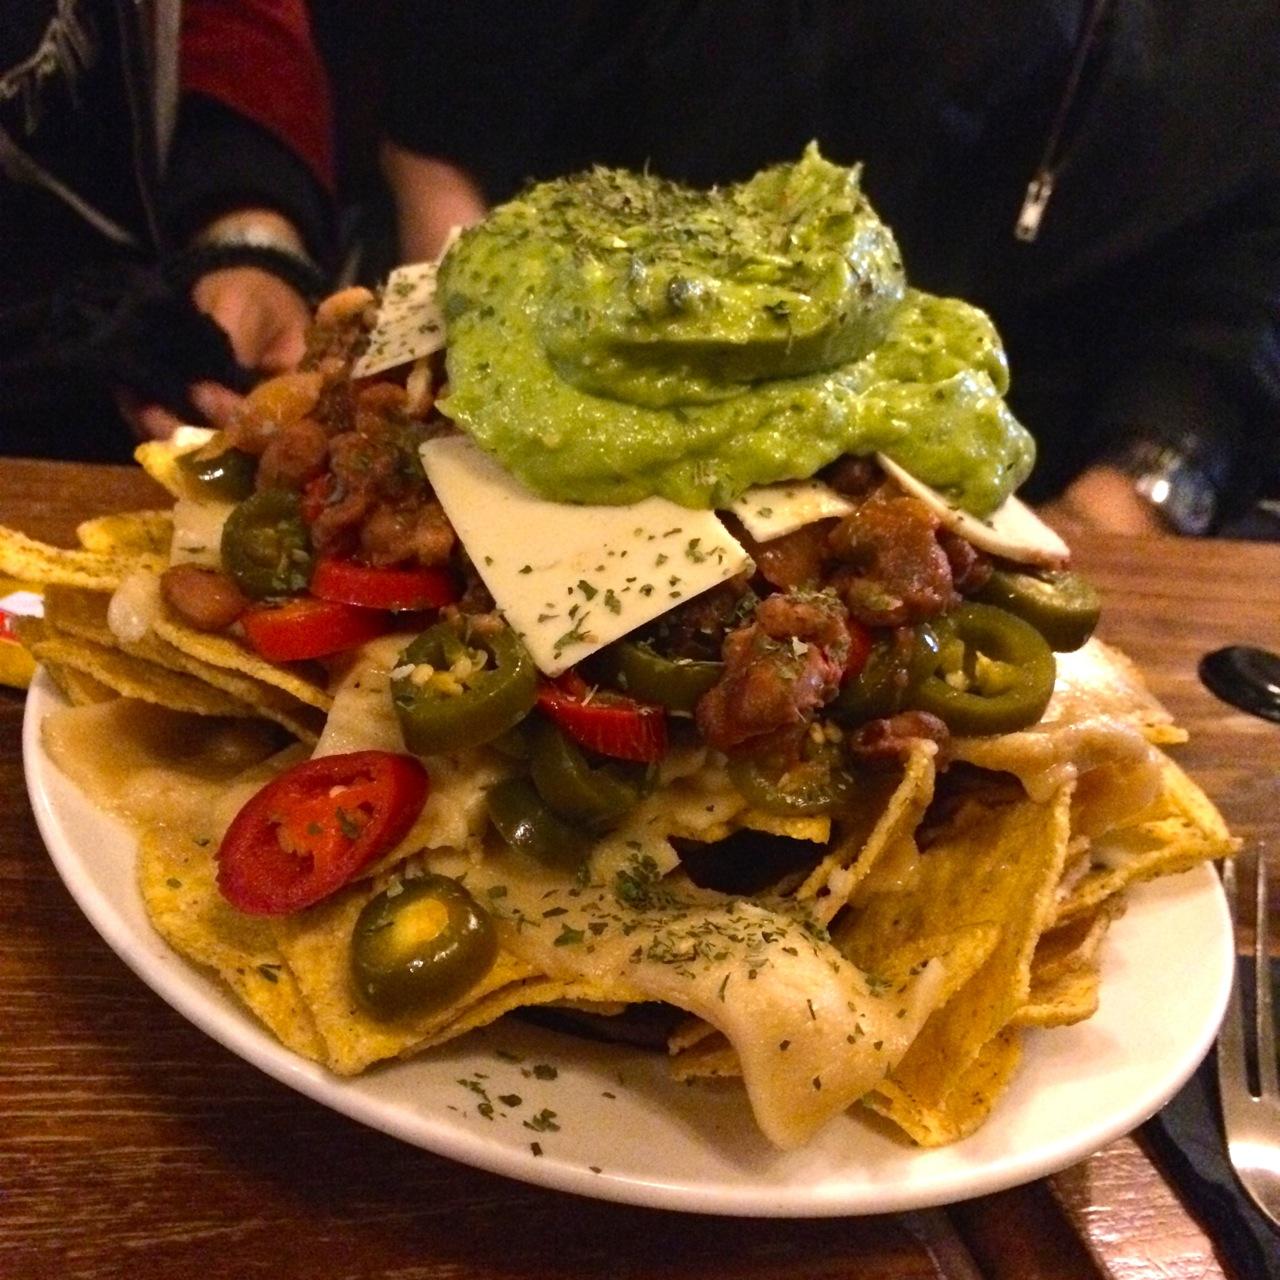 http://i2.wp.com/fatgayvegan.com/wp-content/uploads/2015/08/vegan-nachos.jpg?fit=1280%2C1280